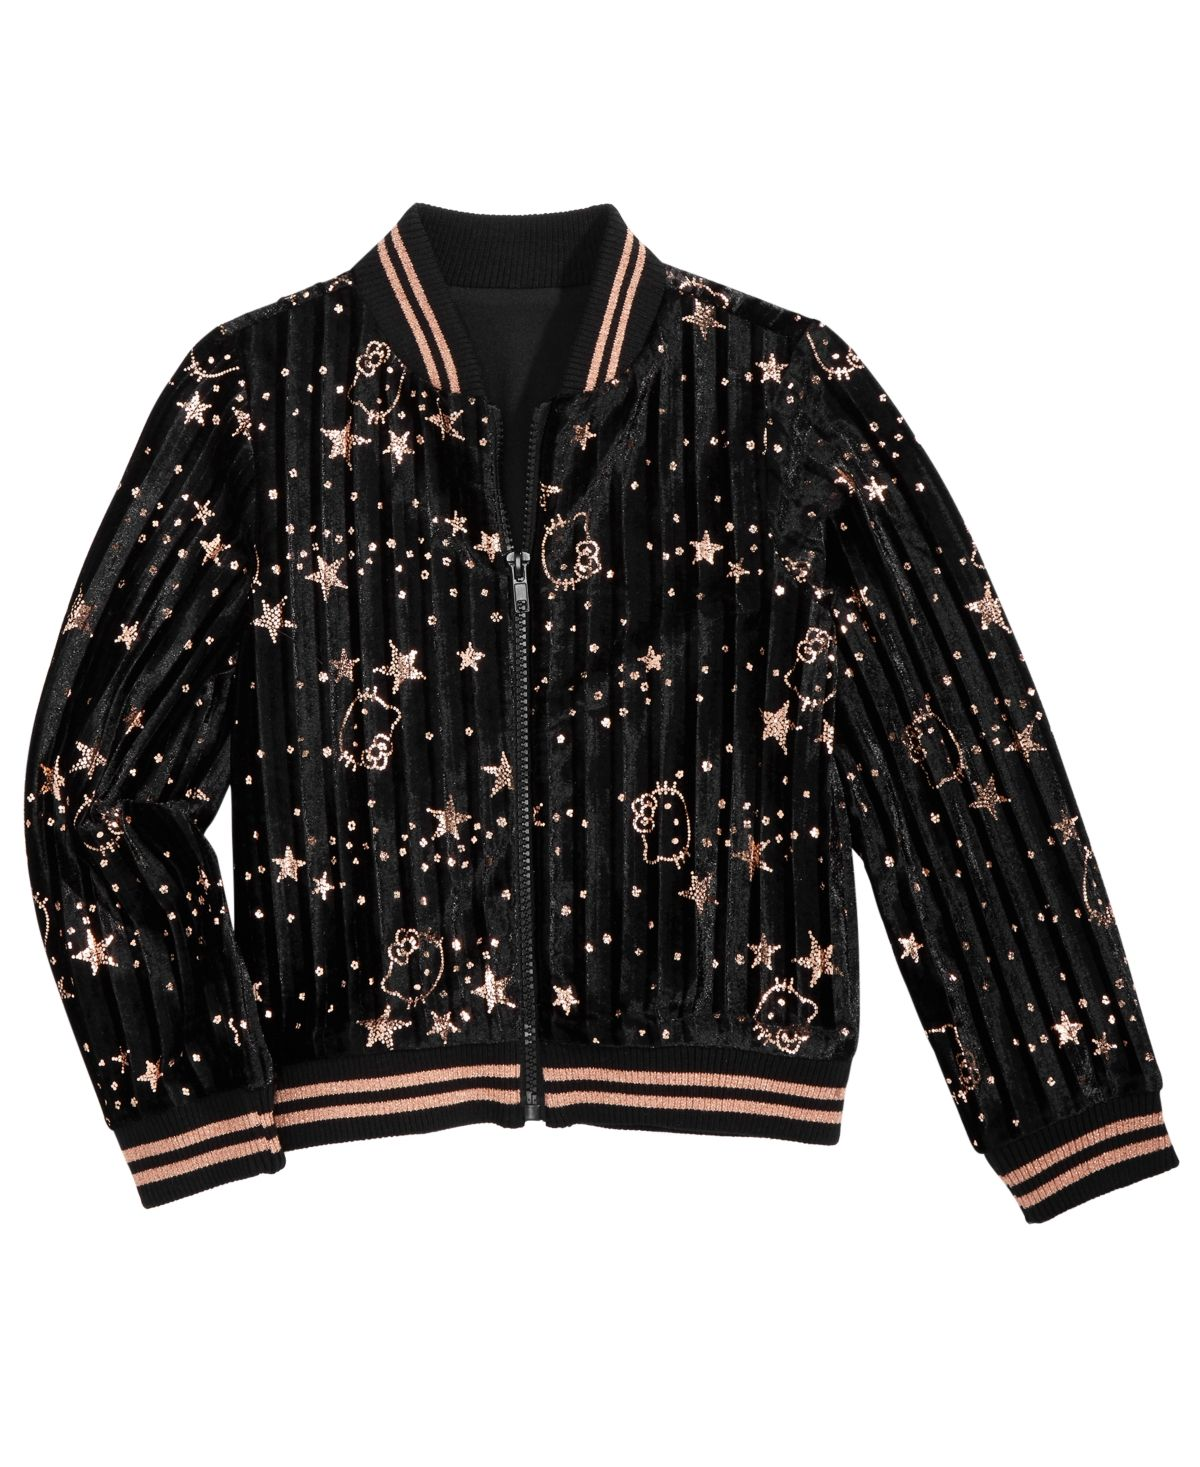 Hello Kitty Toddler Girls Printed Bomber Jacket Black In 2021 Printed Bomber Jacket Big Clothes Bomber Jacket [ 1467 x 1200 Pixel ]